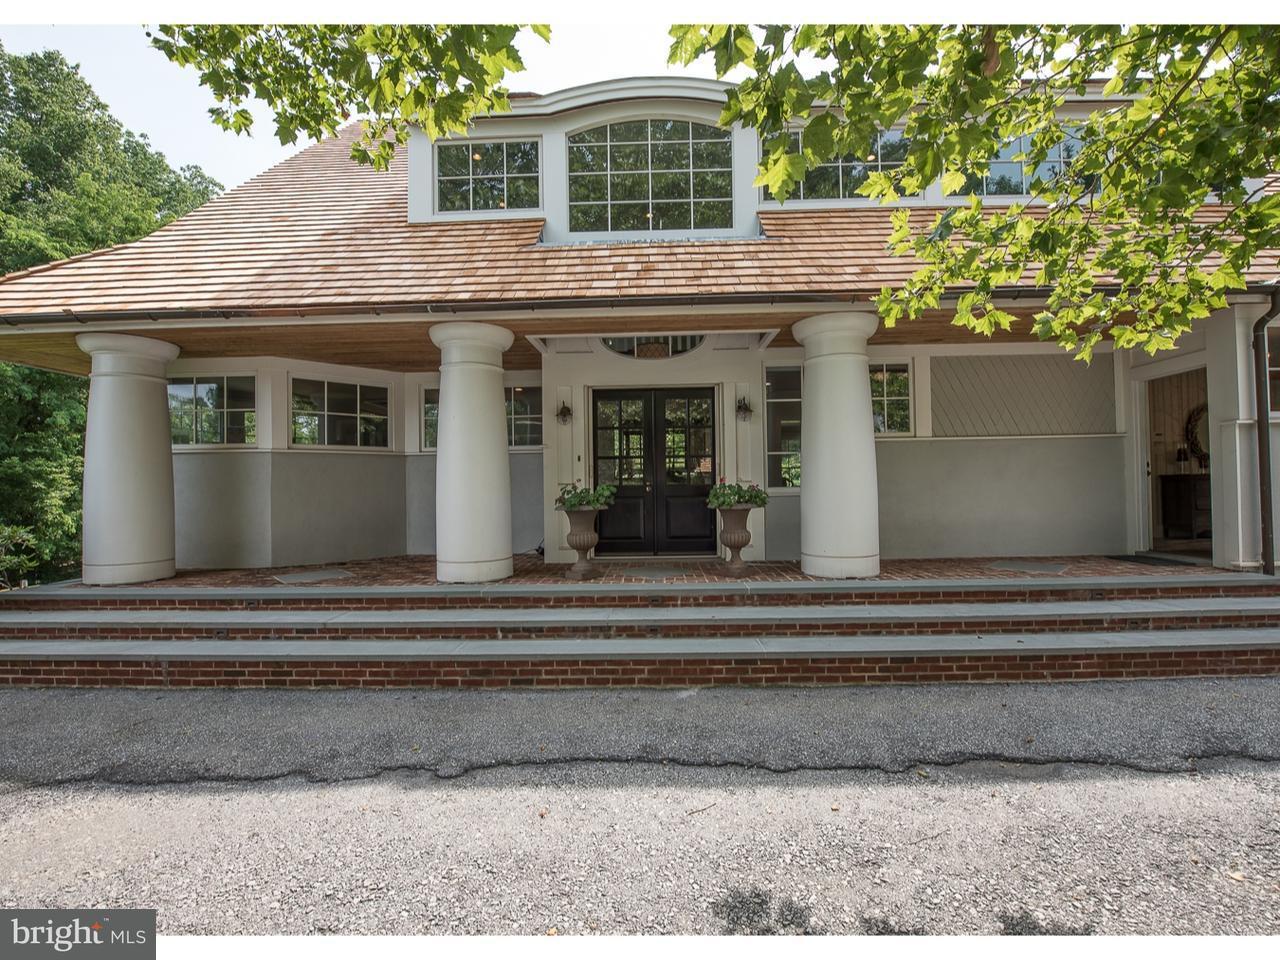 Single Family Home for Sale at 206 WYNDOM Lane Wayne, Pennsylvania 19087 United States